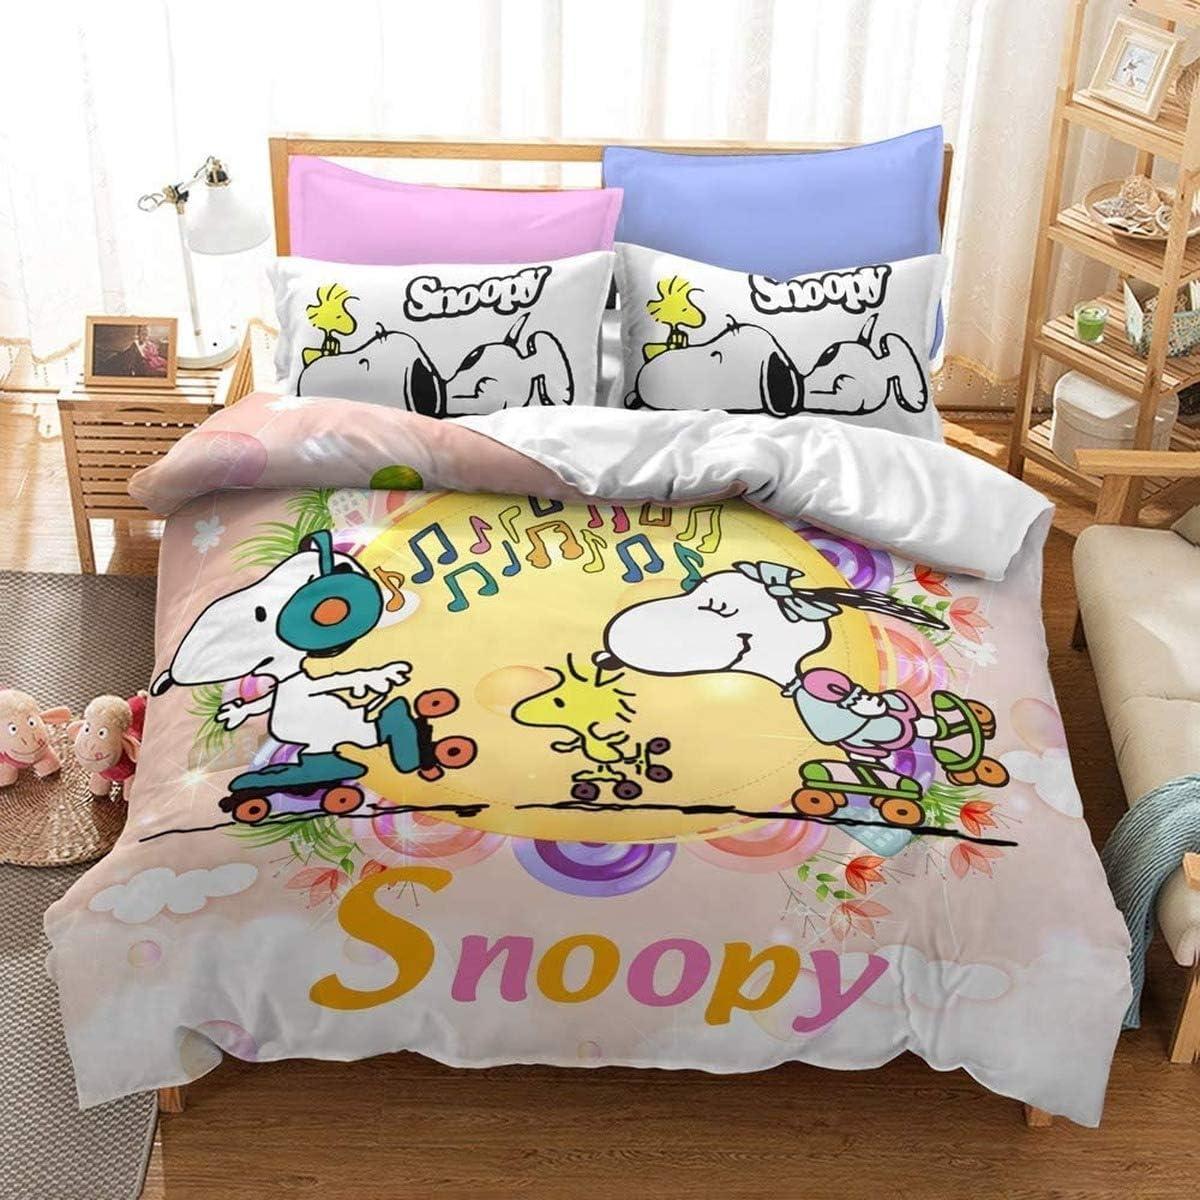 A1,135X200cm+50x75cmx2 QWAS Bettw/äsche Snoopy Pattern Series Bettbezug Weiche hochwertige Bettbezug aus Mikrofaser